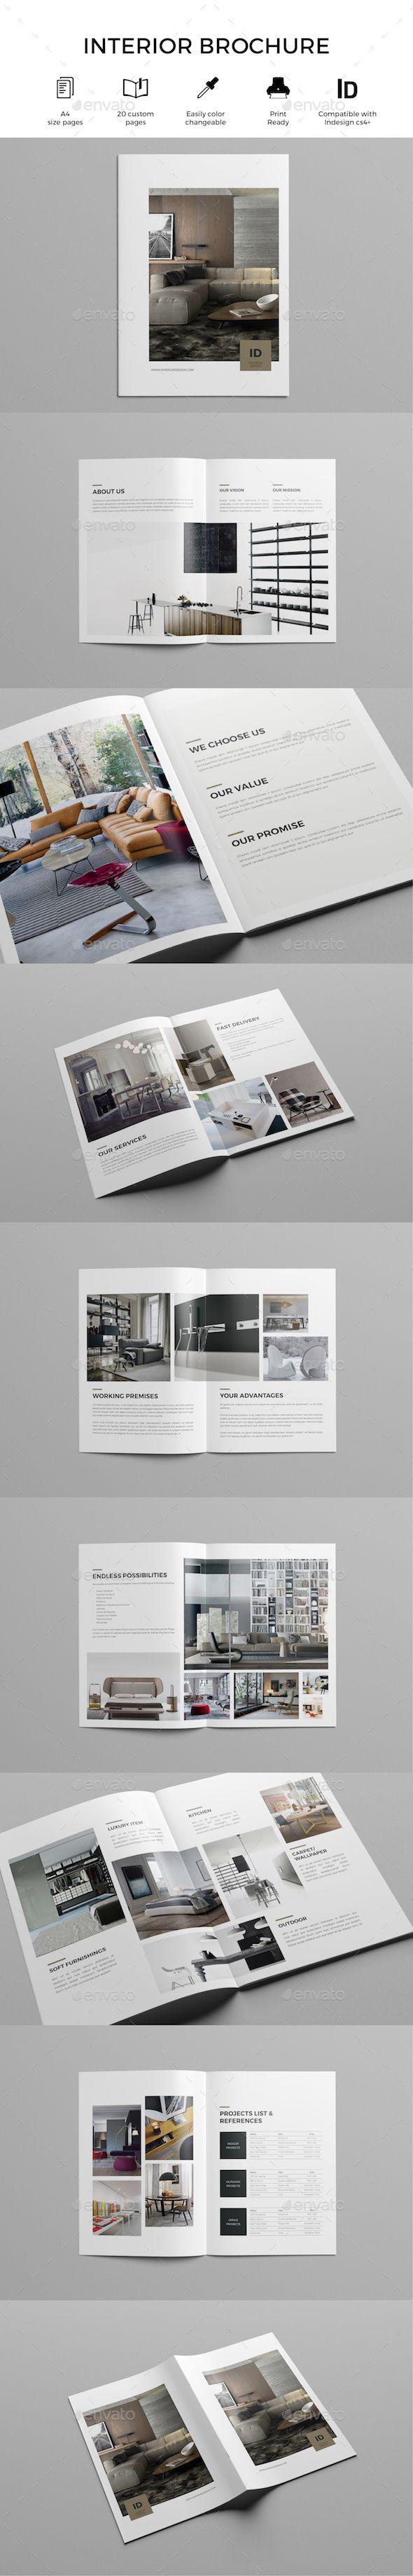 Furniture and Interior Catalog – Interior Design Brochure Template